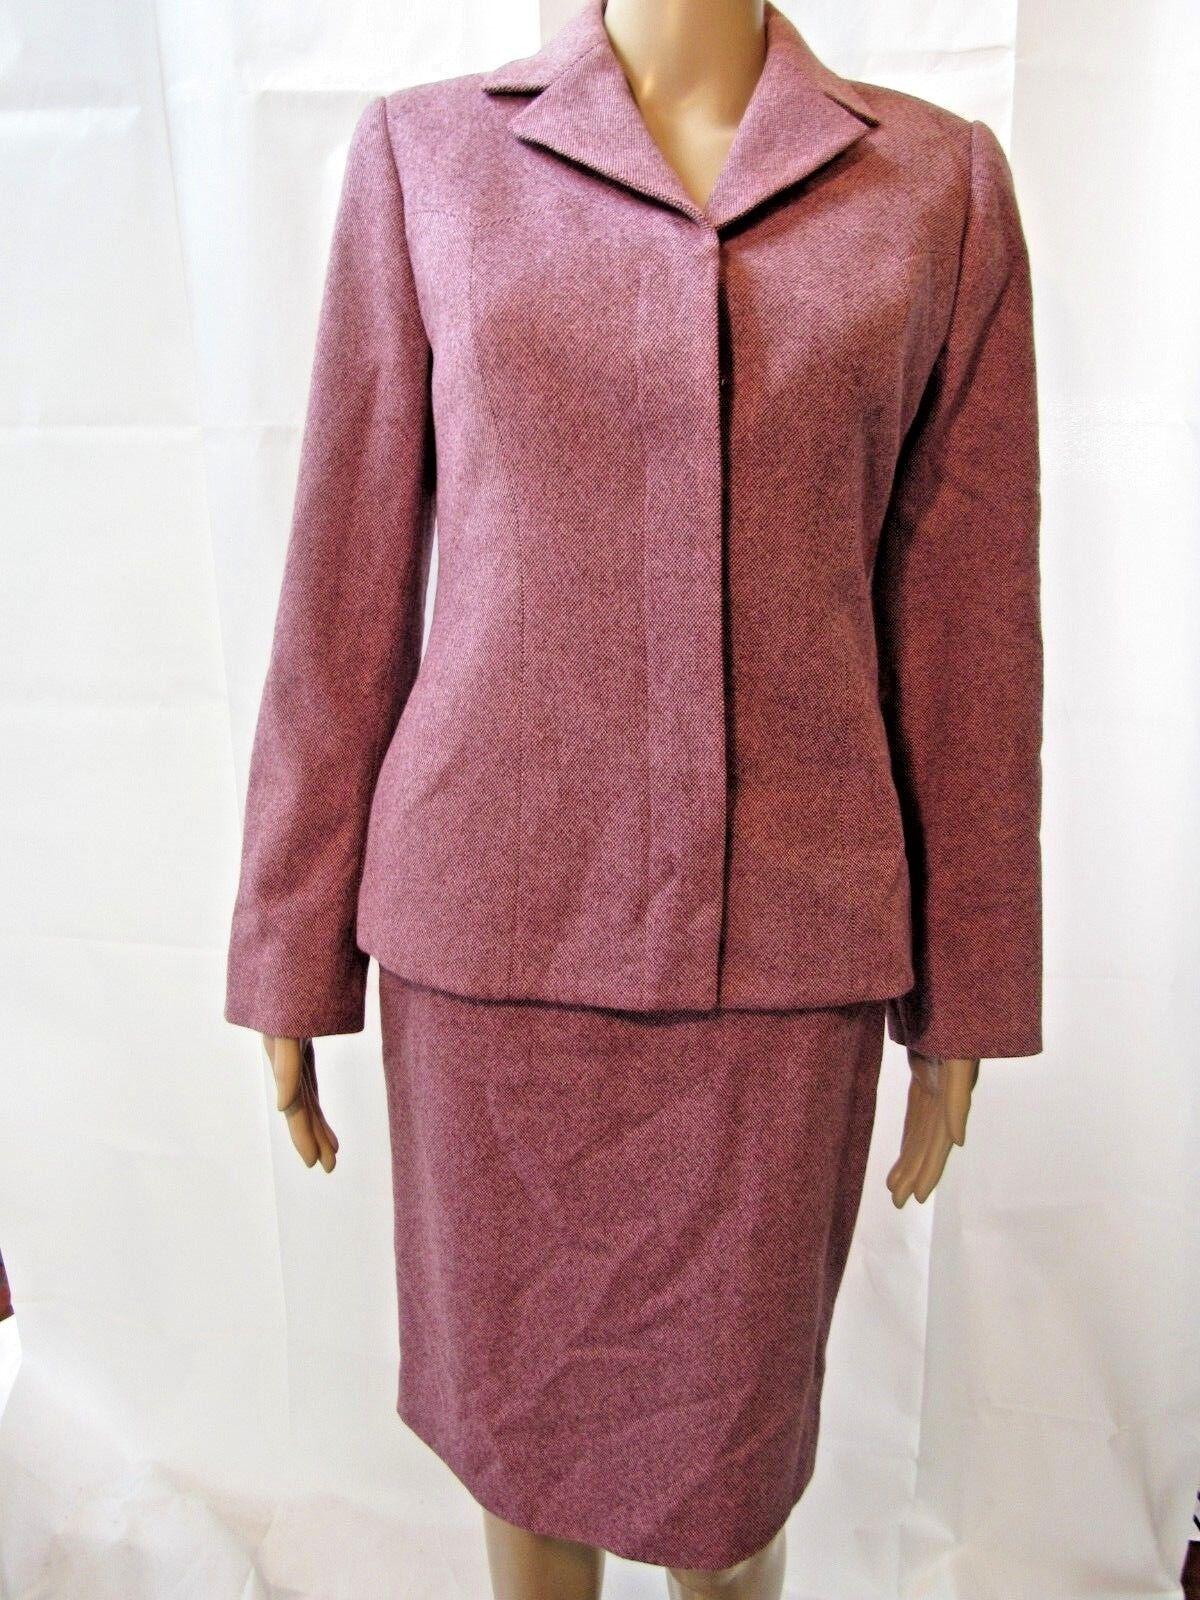 Carolina Herrera Burgundy  Pink Skirt Suit  Sz 8-6